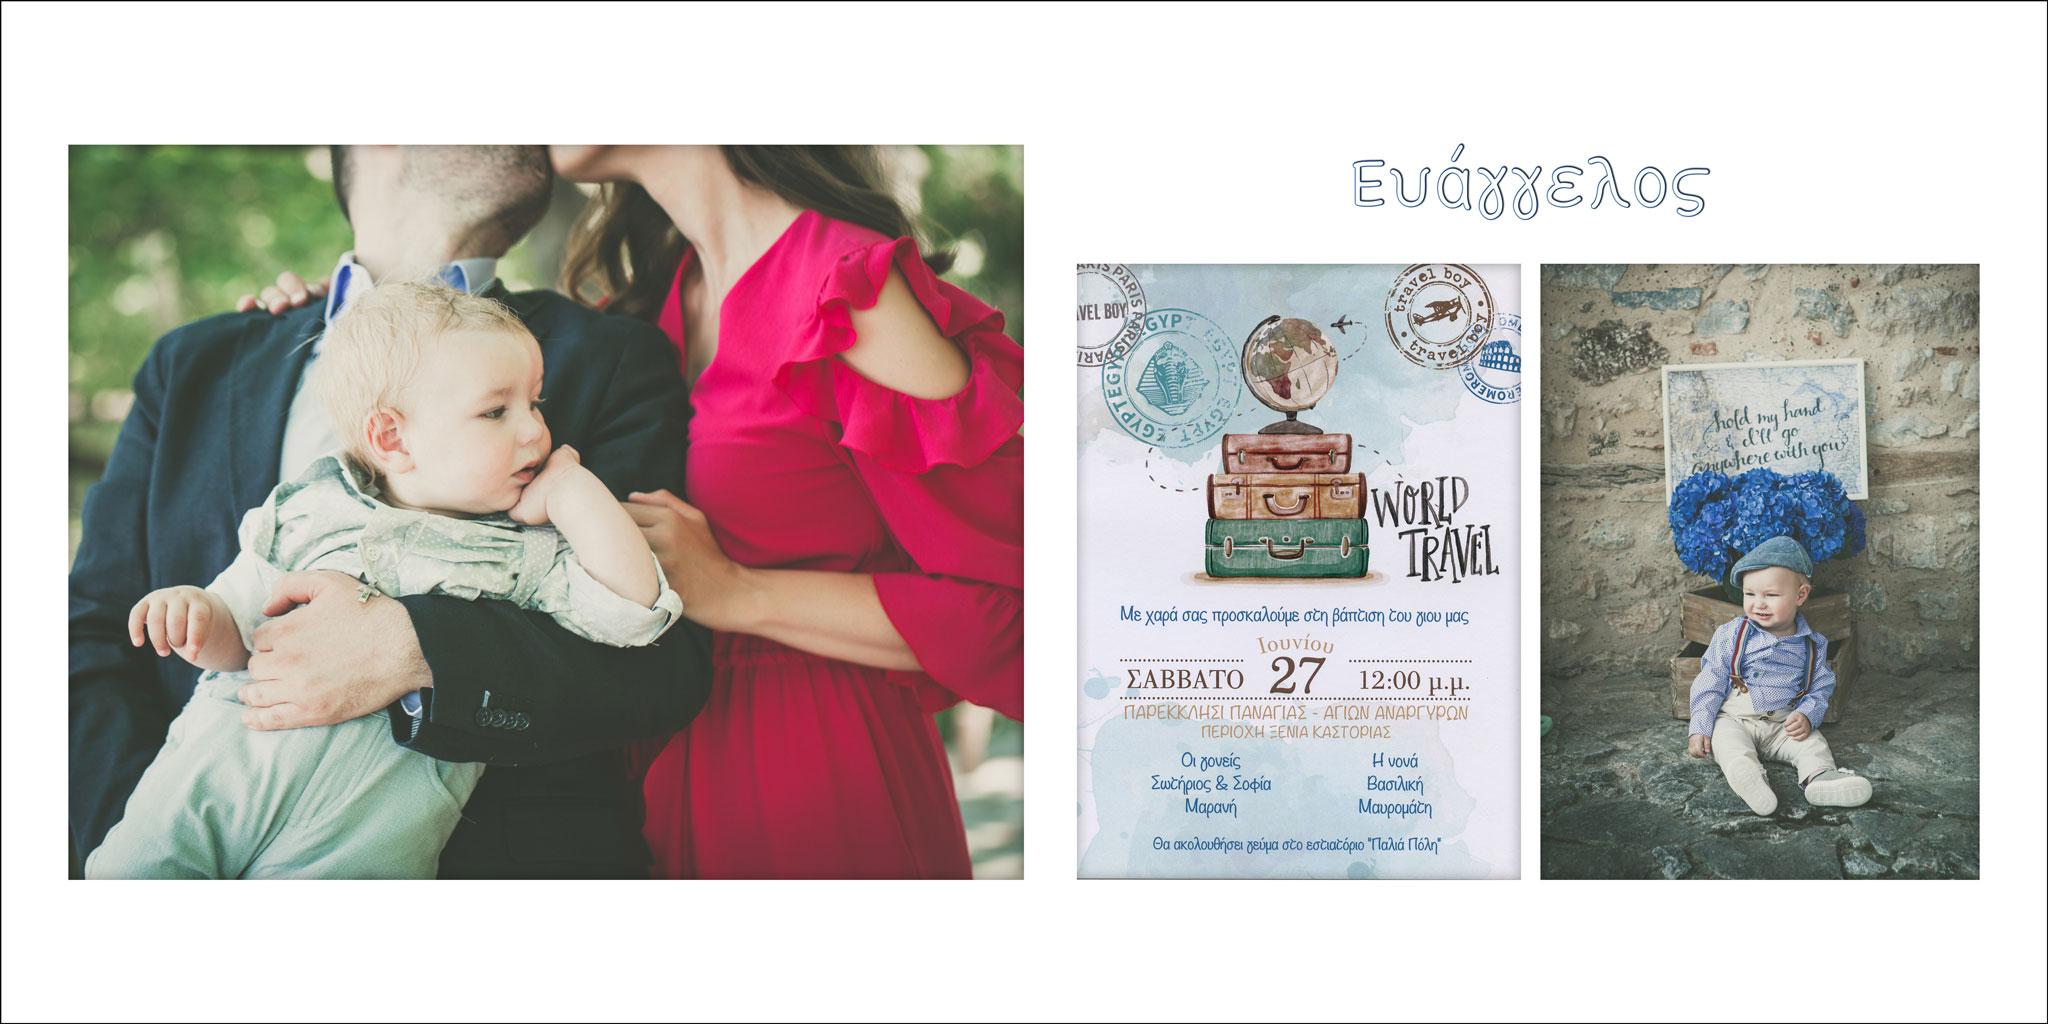 euaggelos_01